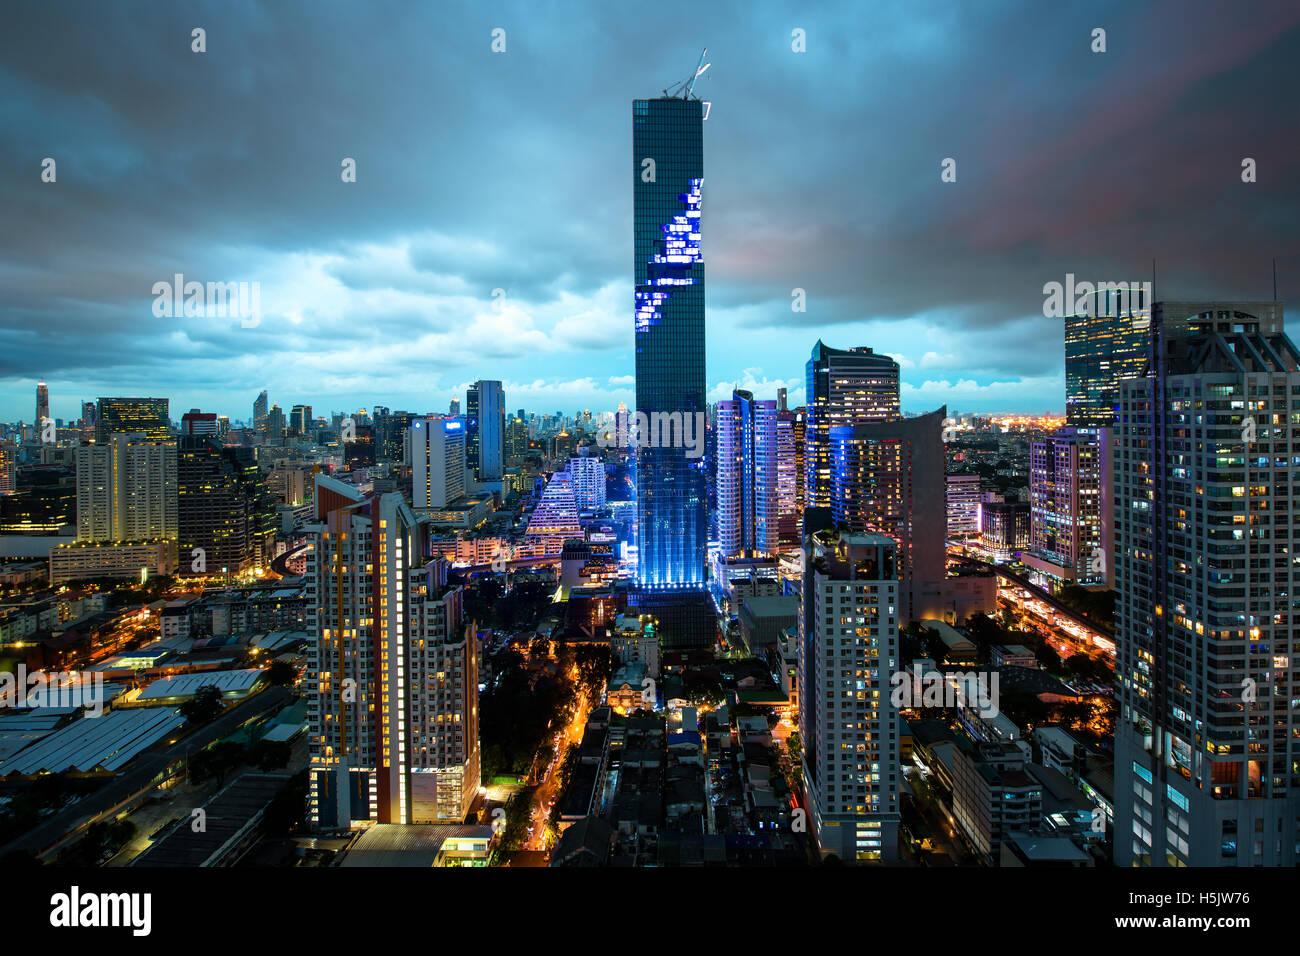 Bangkok city skyline, Mahanakhon skyscraper tower is tallest buildings in Thailand, Silom area, Bangkok Thailand - Stock Image